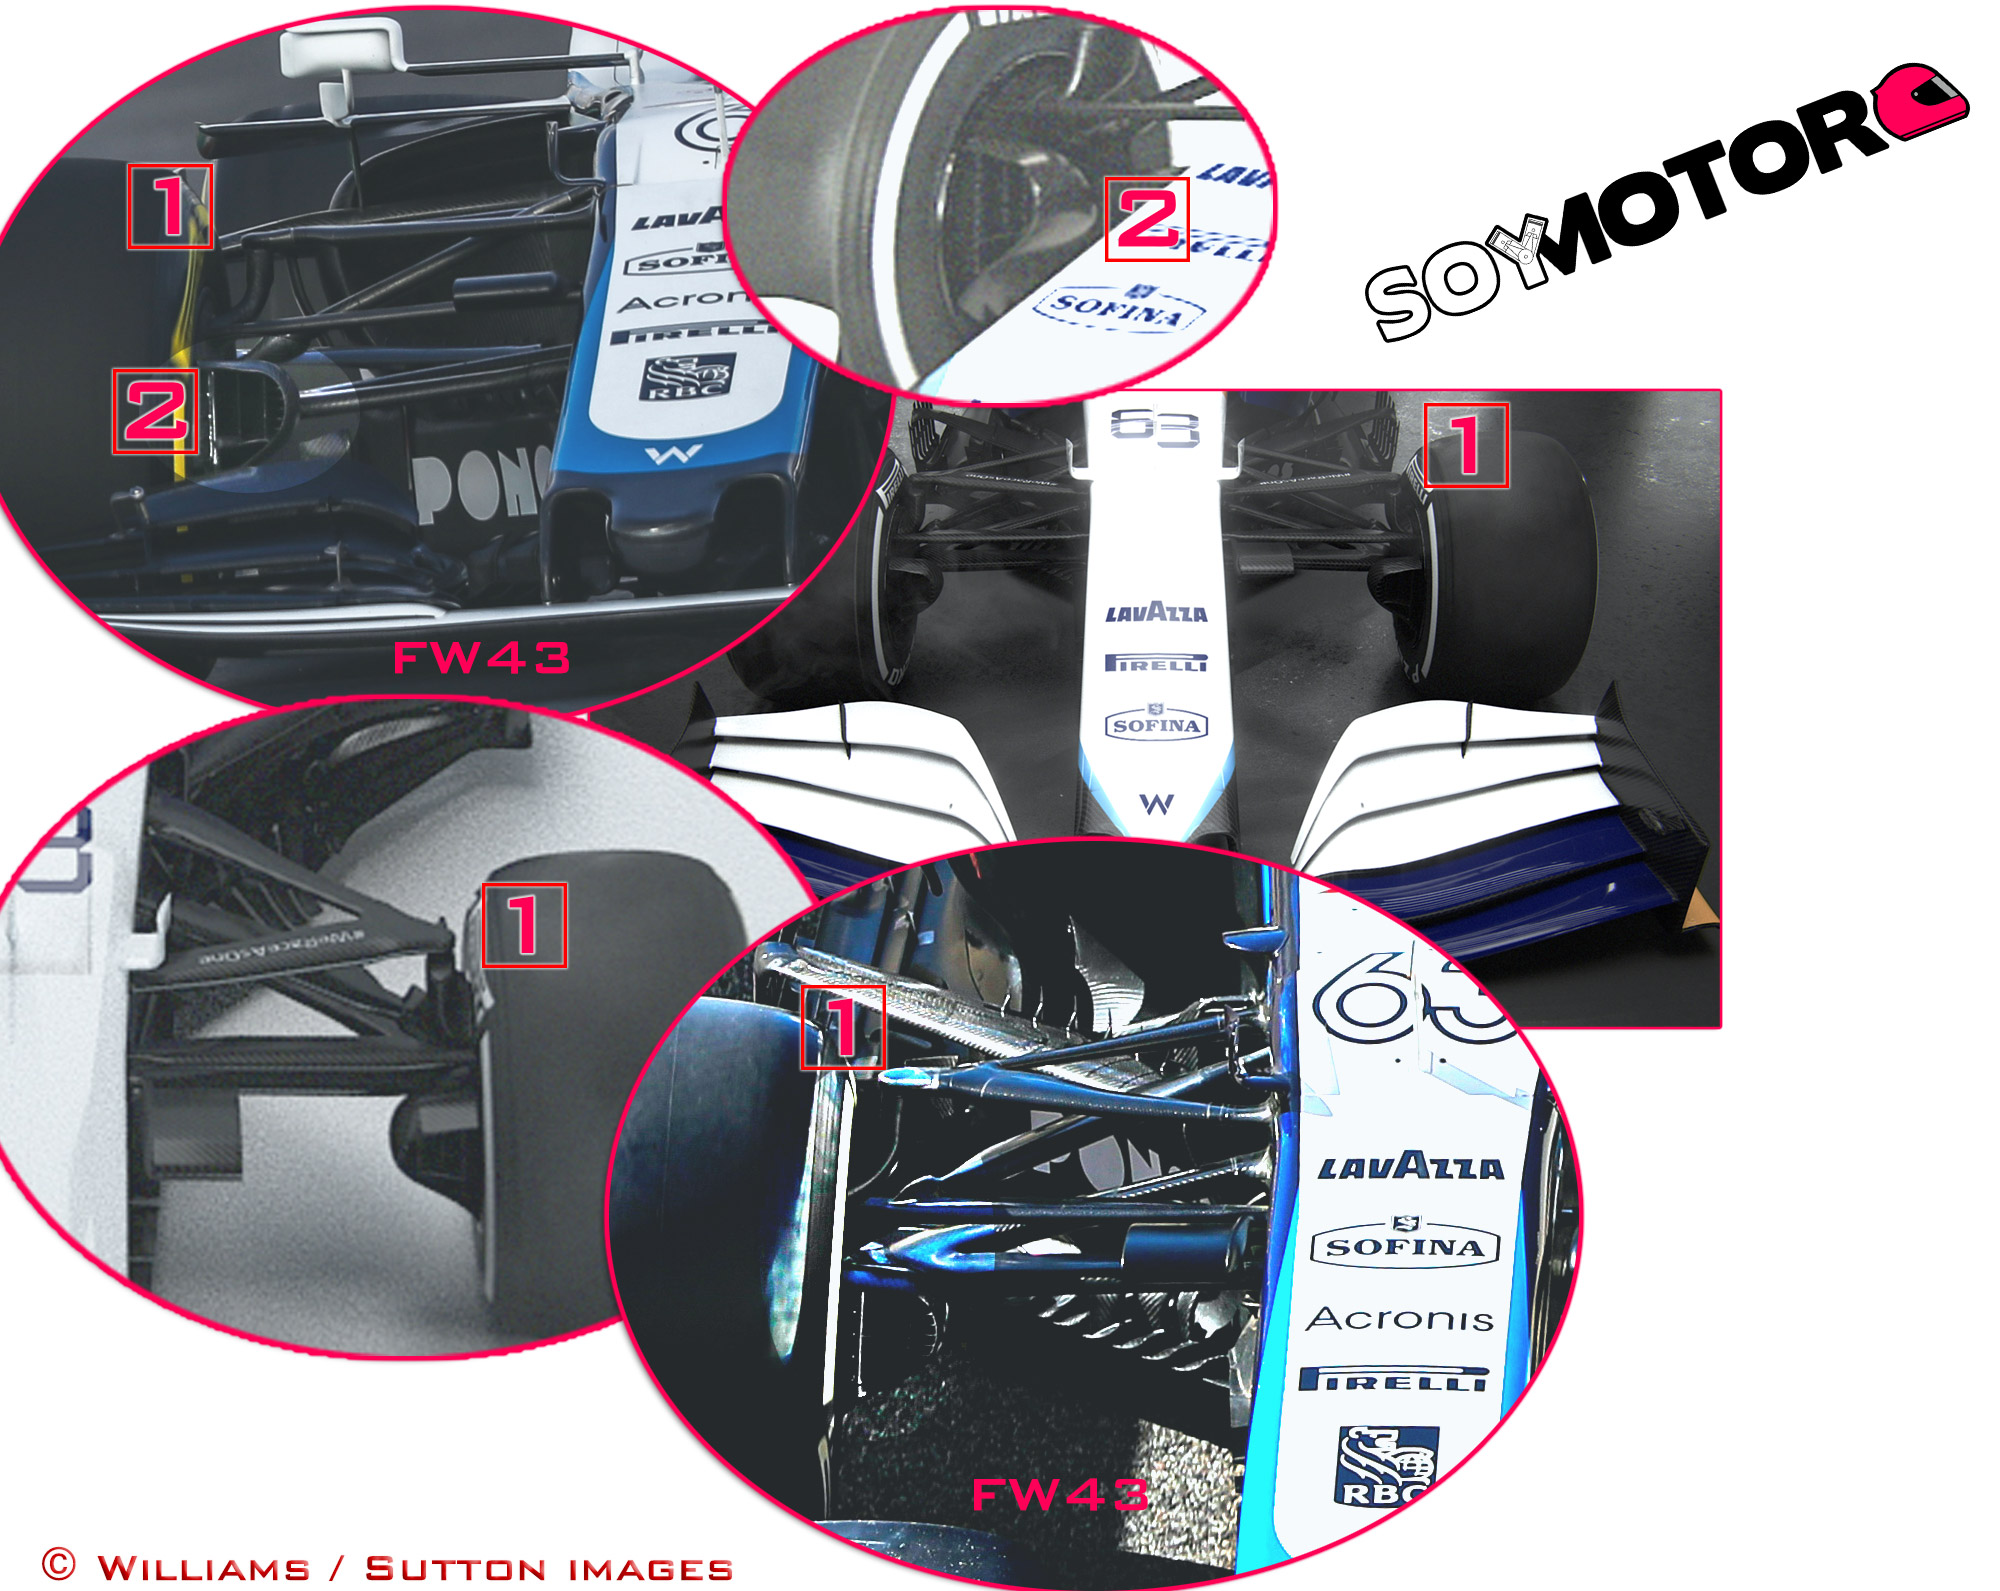 williams-fw43b-frontal-2-soymotor.jpg